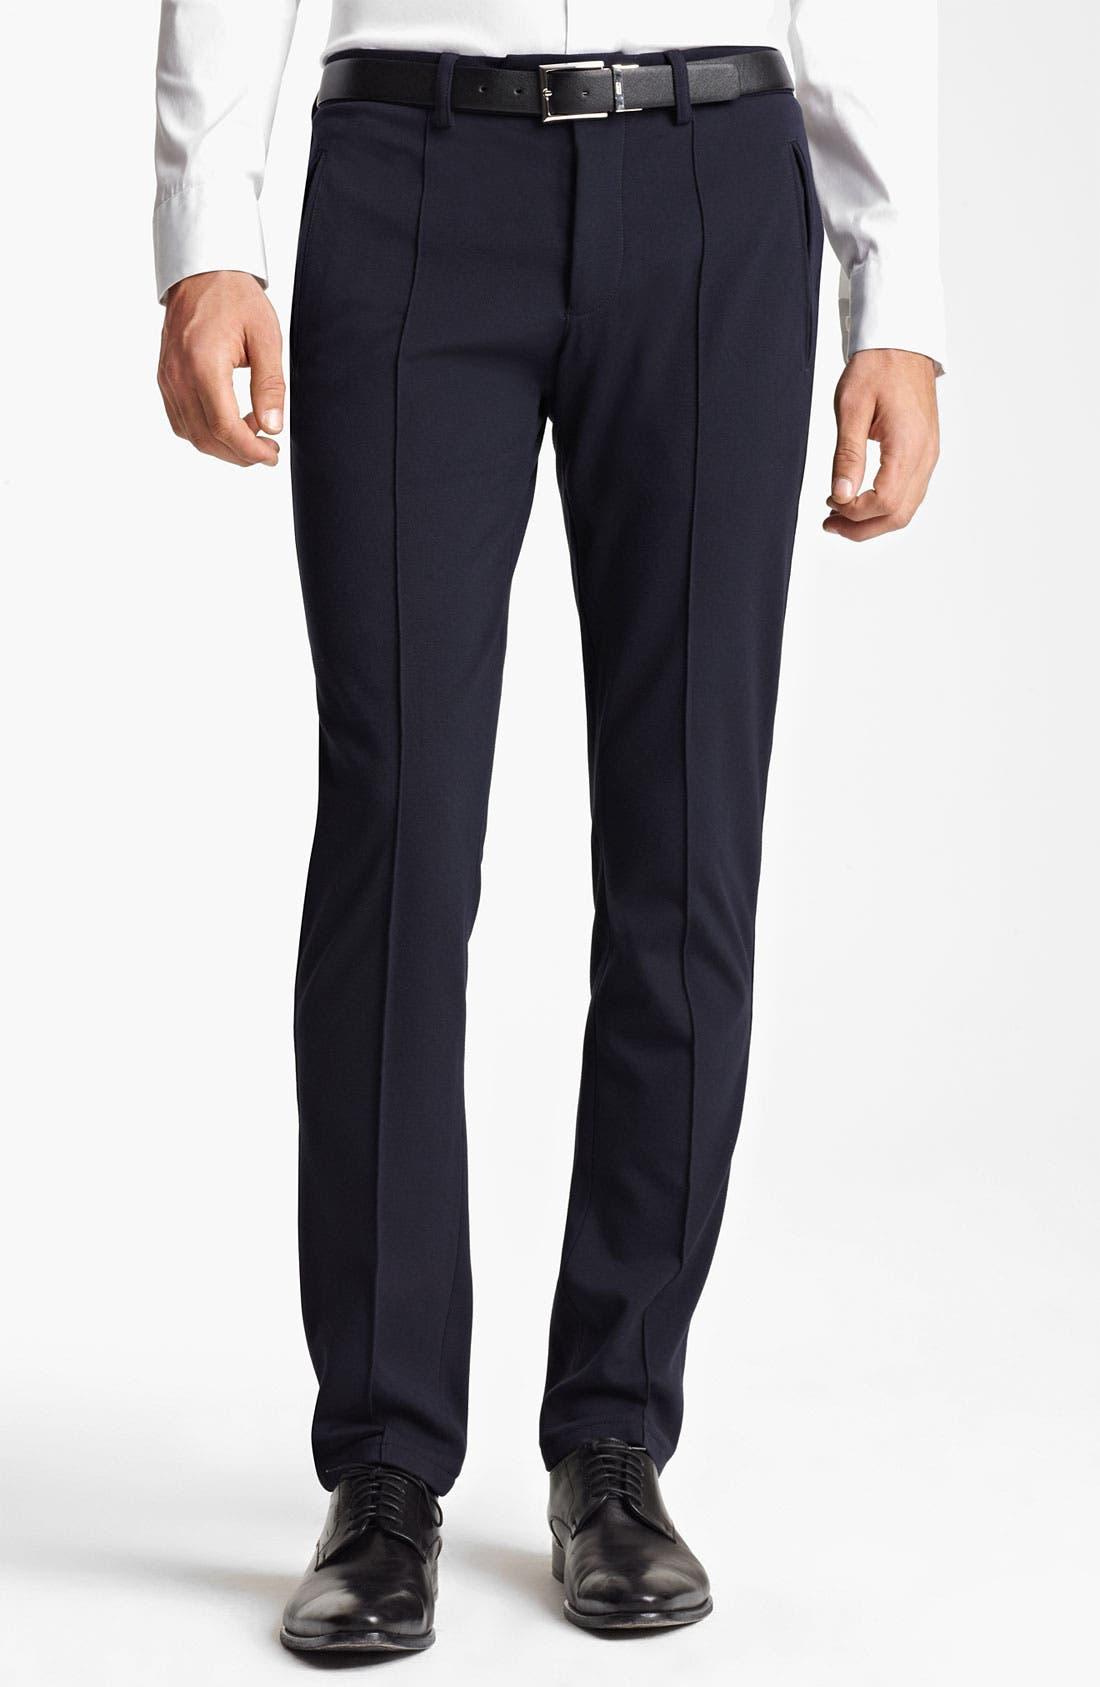 Main Image - Armani Collezioni Jersey Stretch Slim Fit Trousers